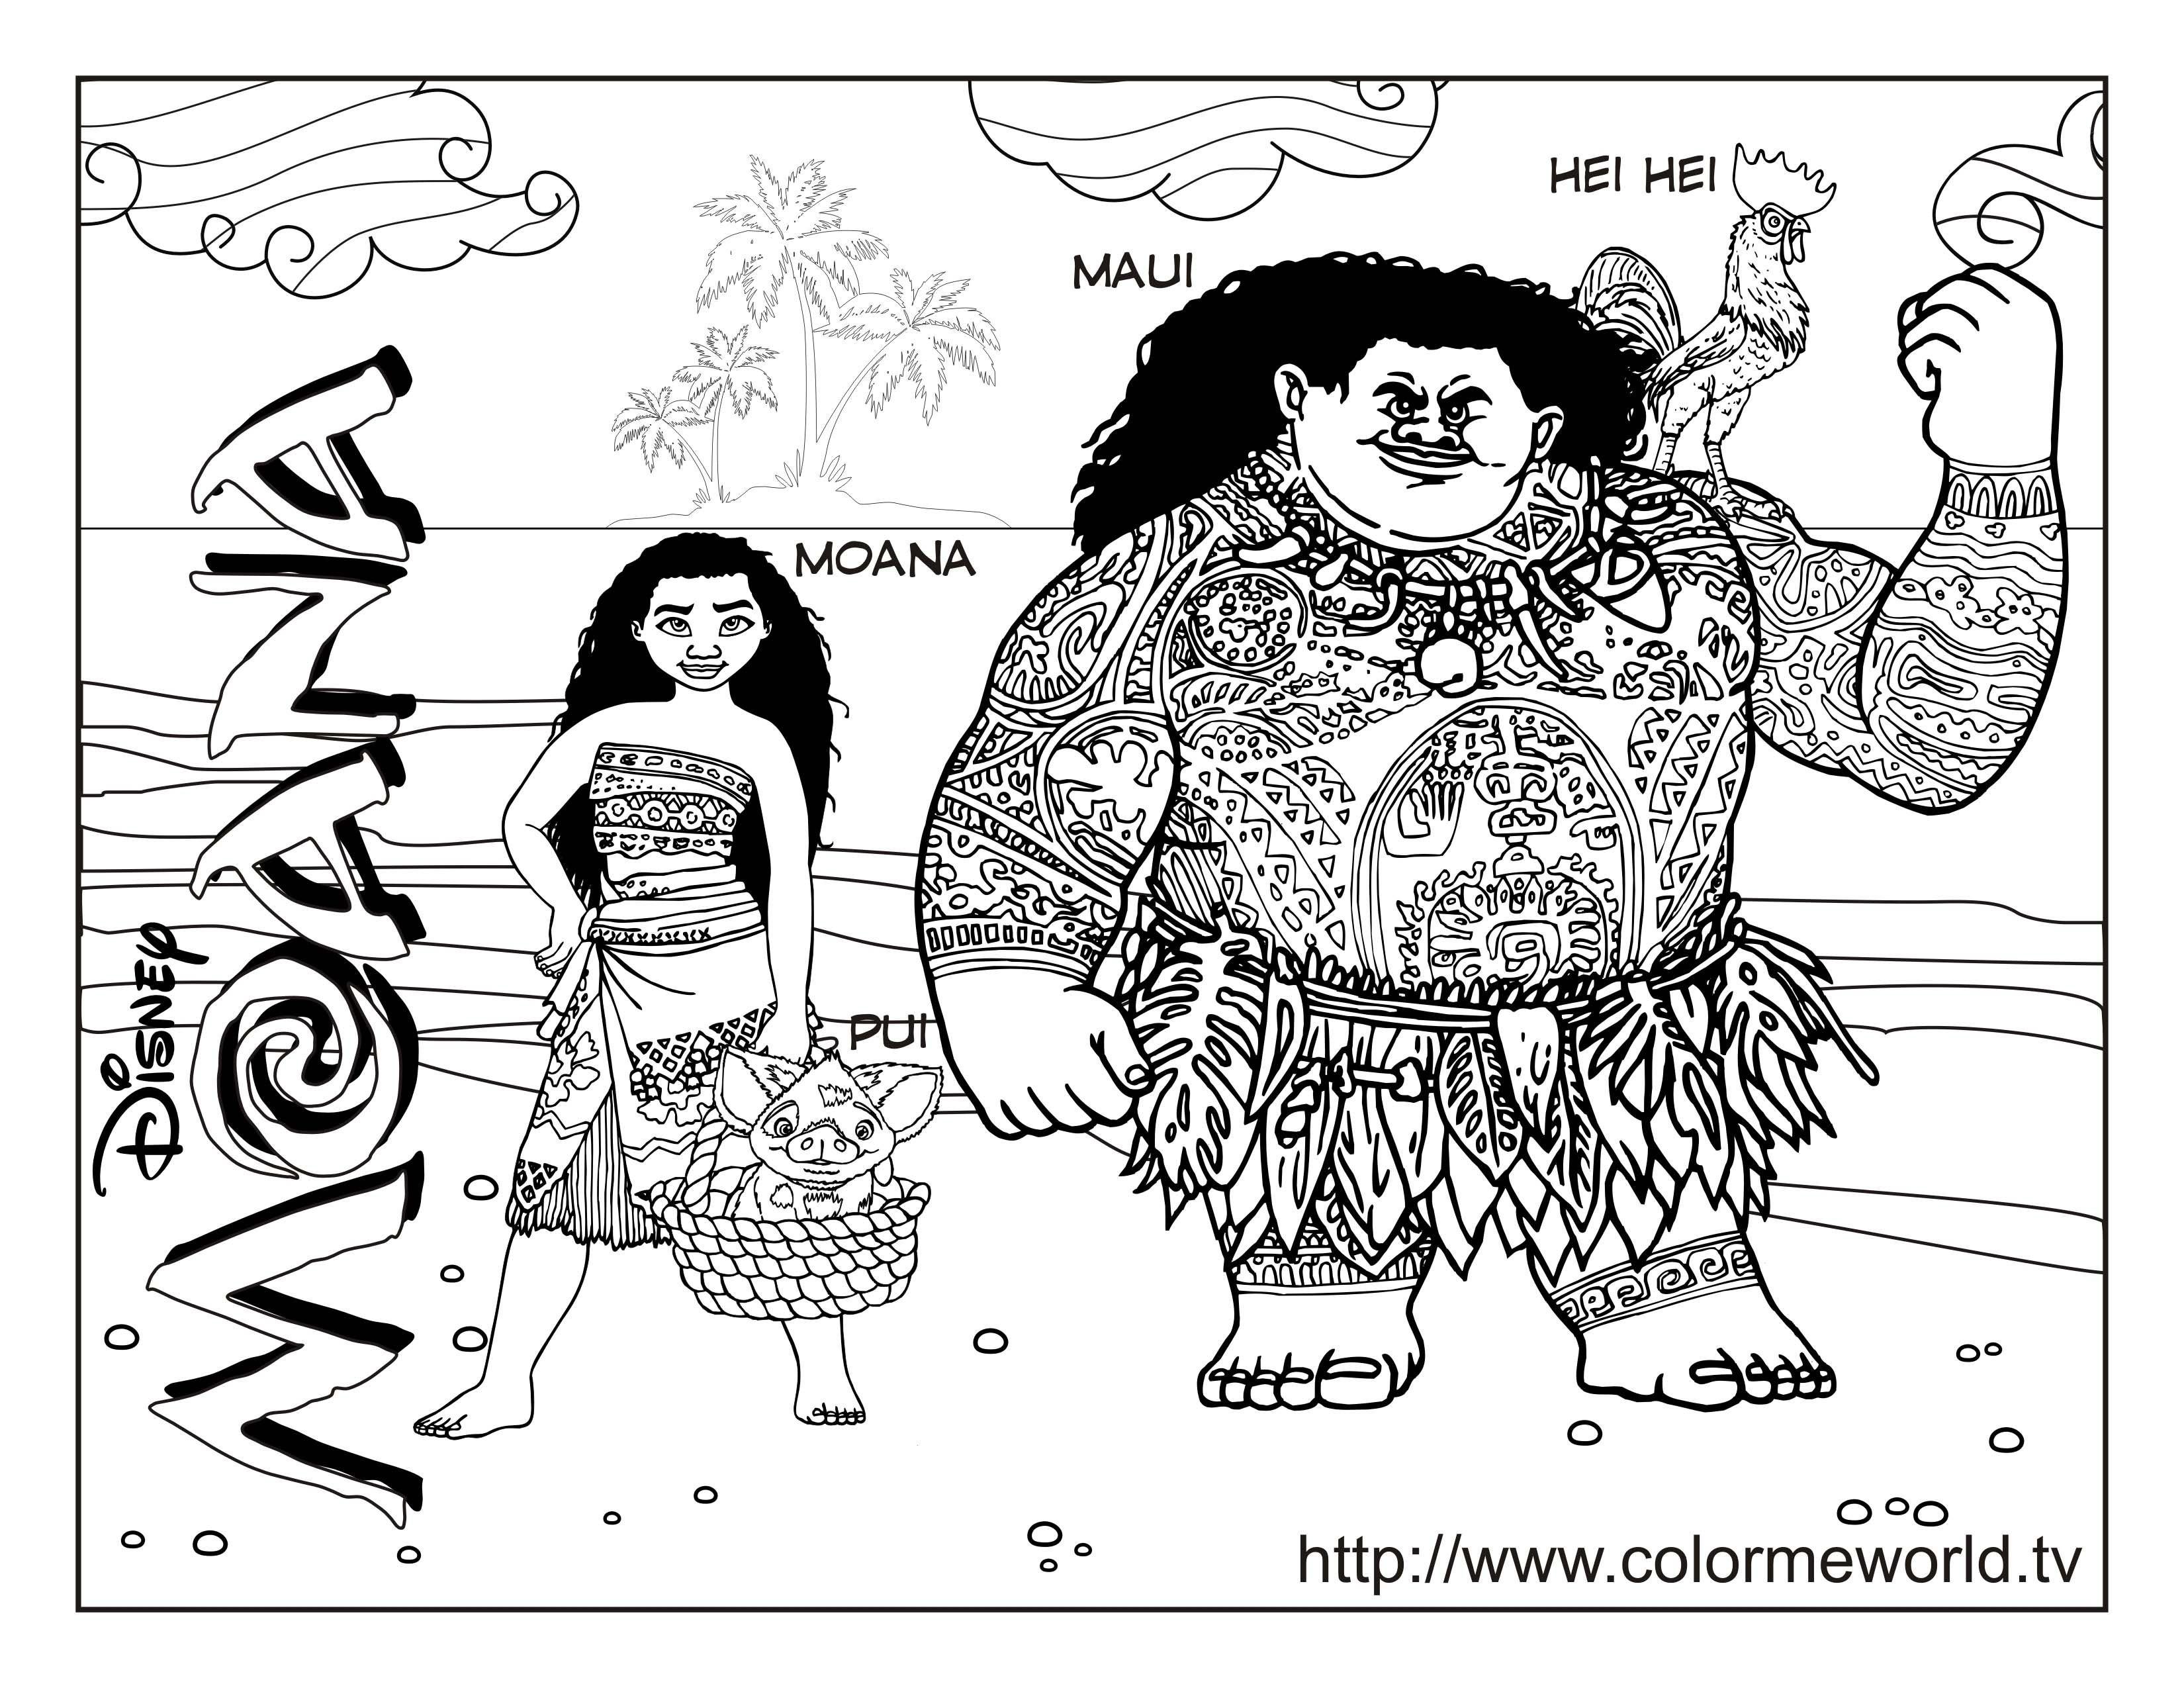 Moana Coloring Pages : Free Printable Moana Pdf Coloring Sheets For - Moana Coloring Pages Free Printable